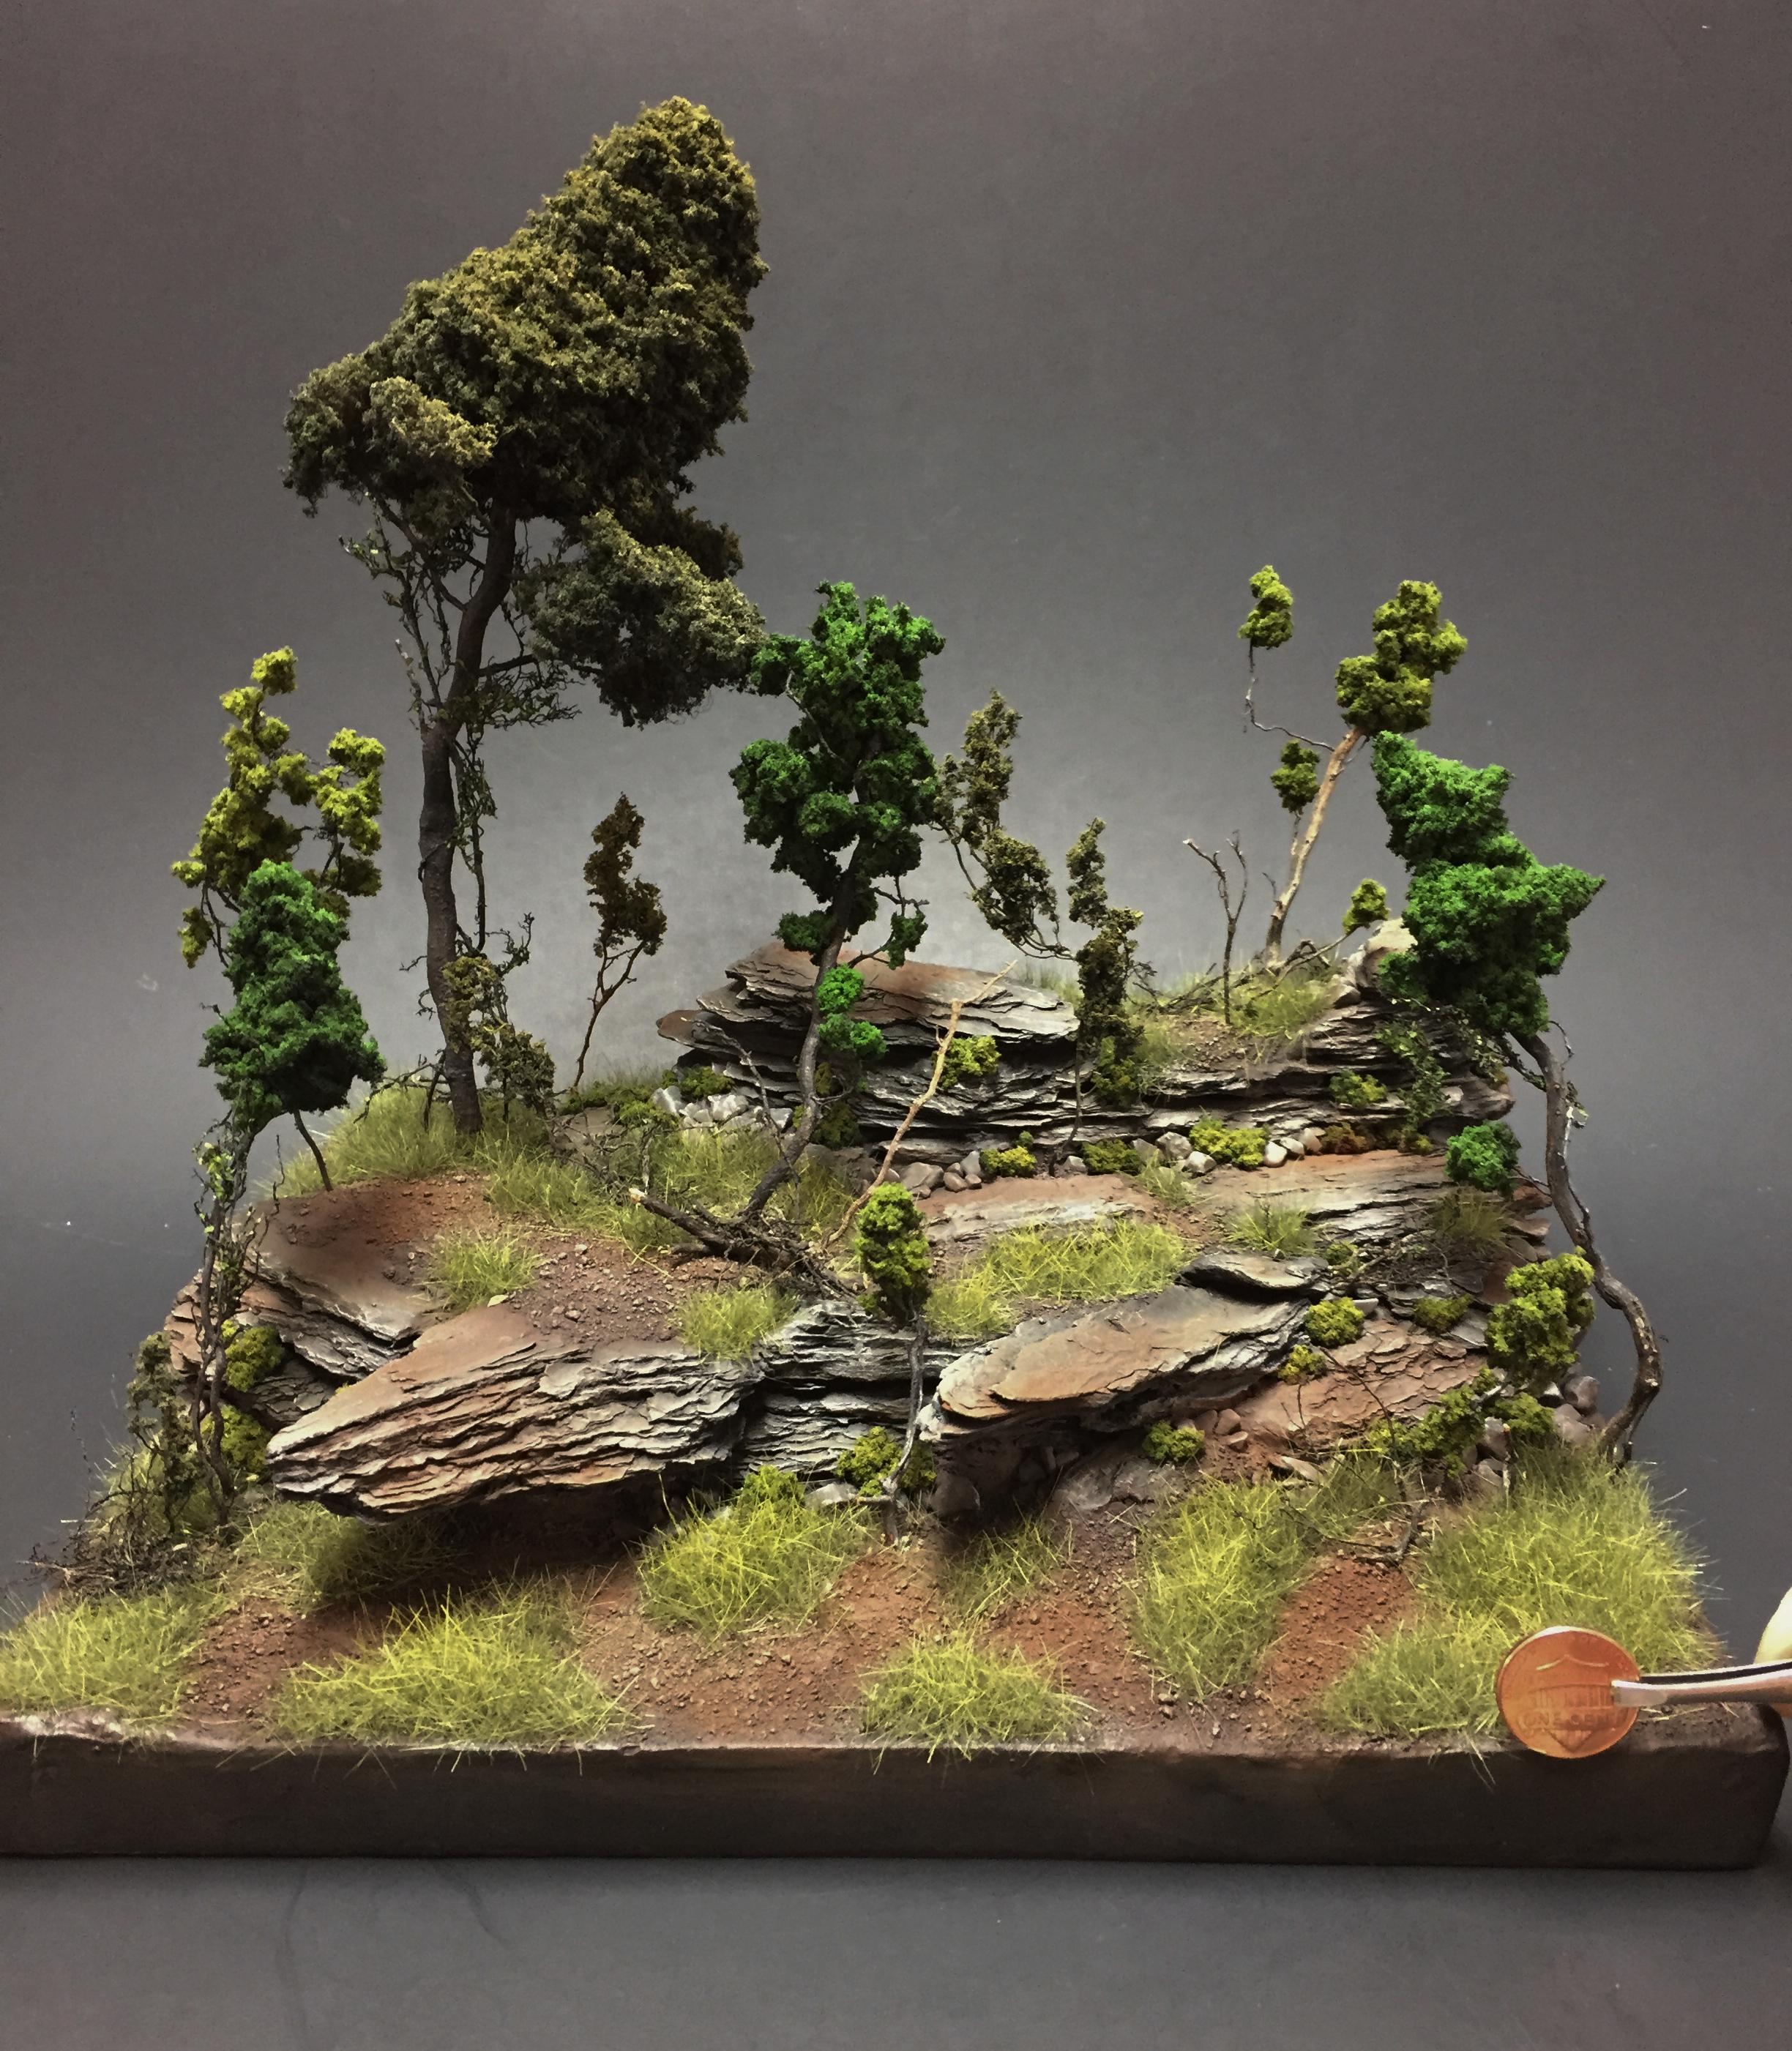 Diorama, Fauna, Landscape, Terrian, Trees, Vine